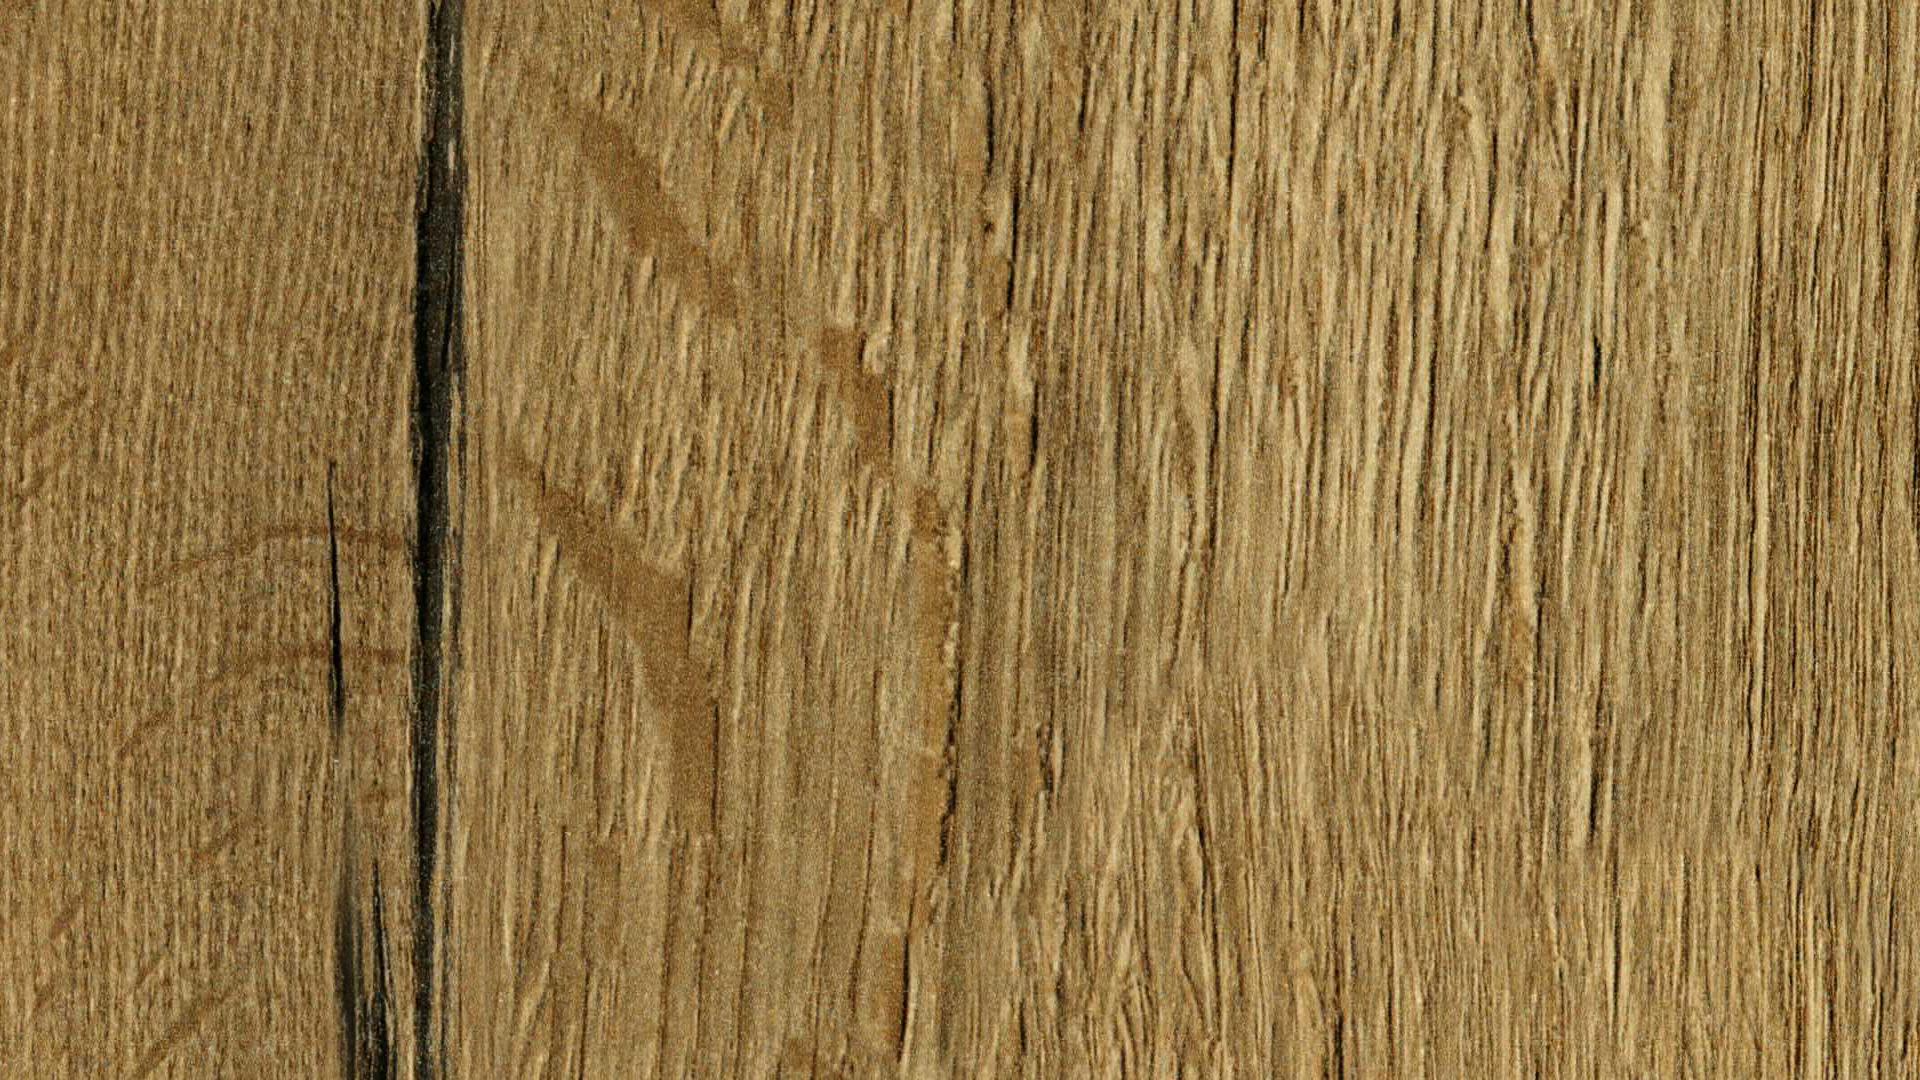 Vintage Oak seamless texture | FlyingArchitecture